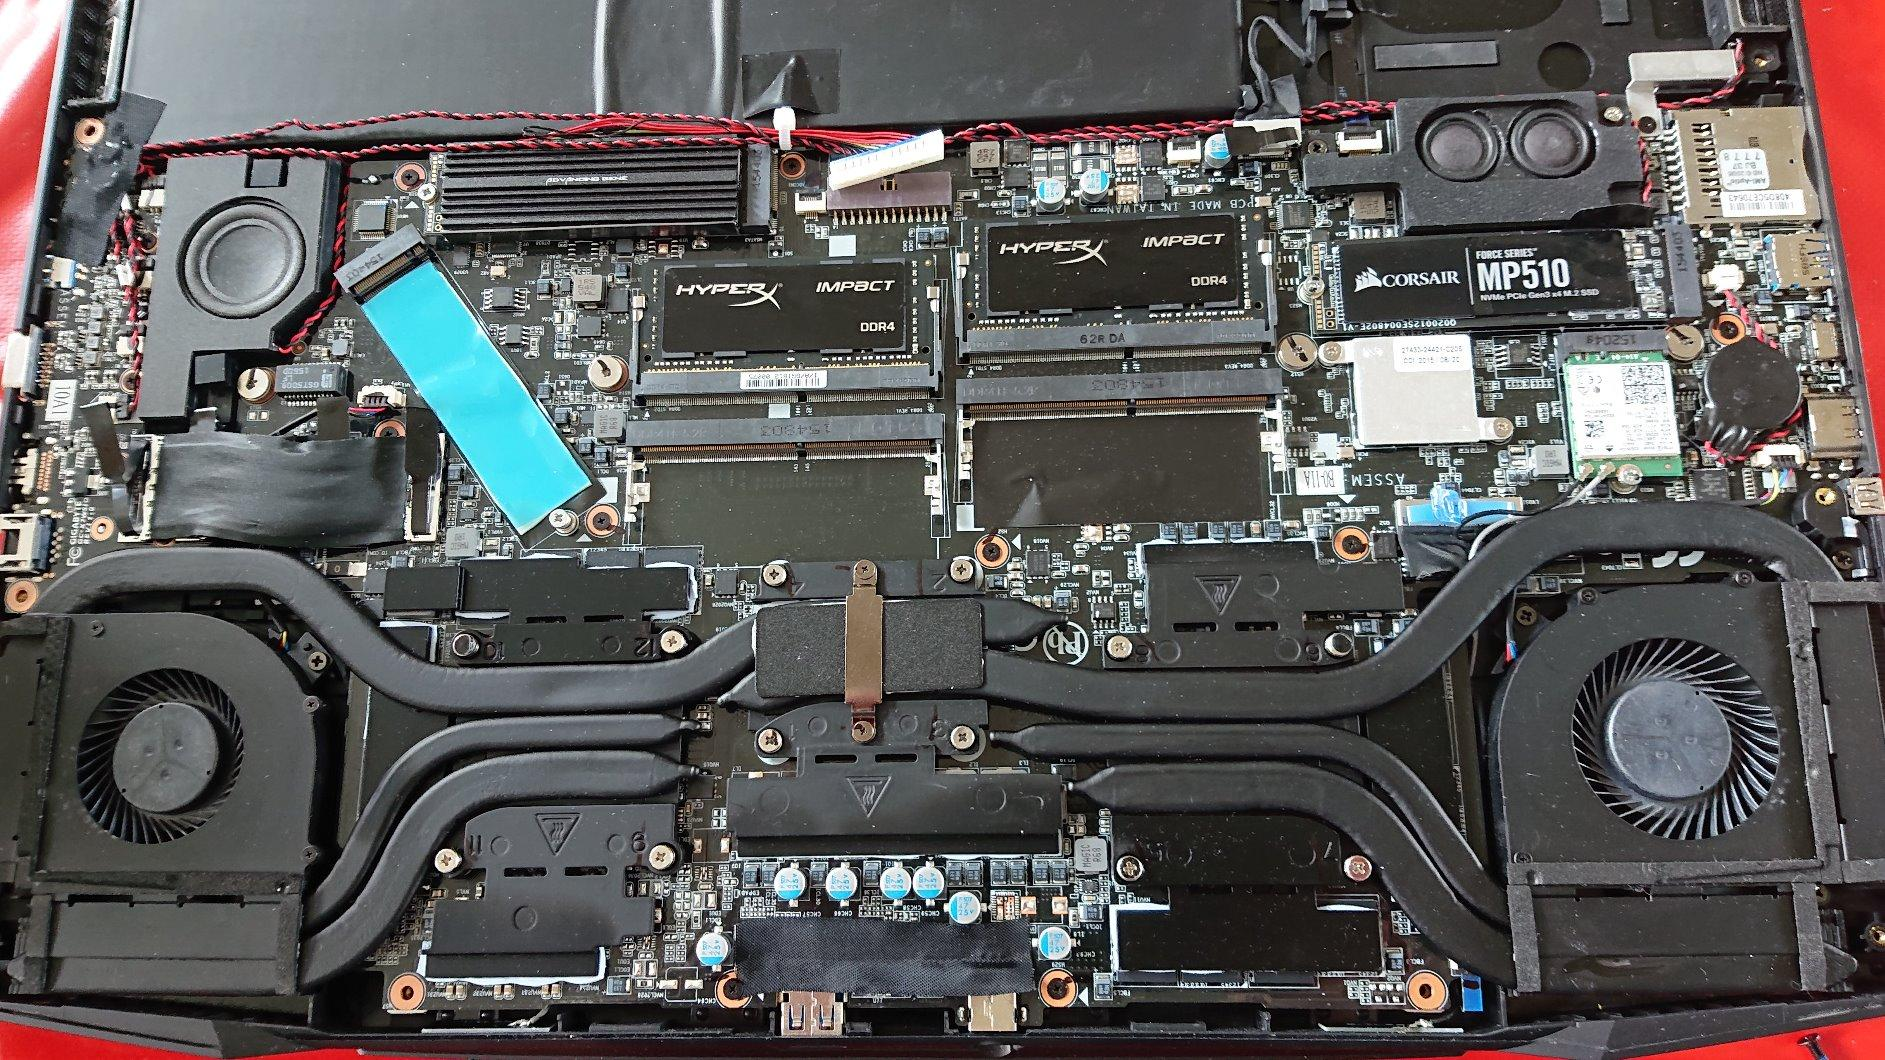 HyperX Impact DDR4 32GB (Kit 2x16GB), 2400 MHz CL14 SODIMM XMP